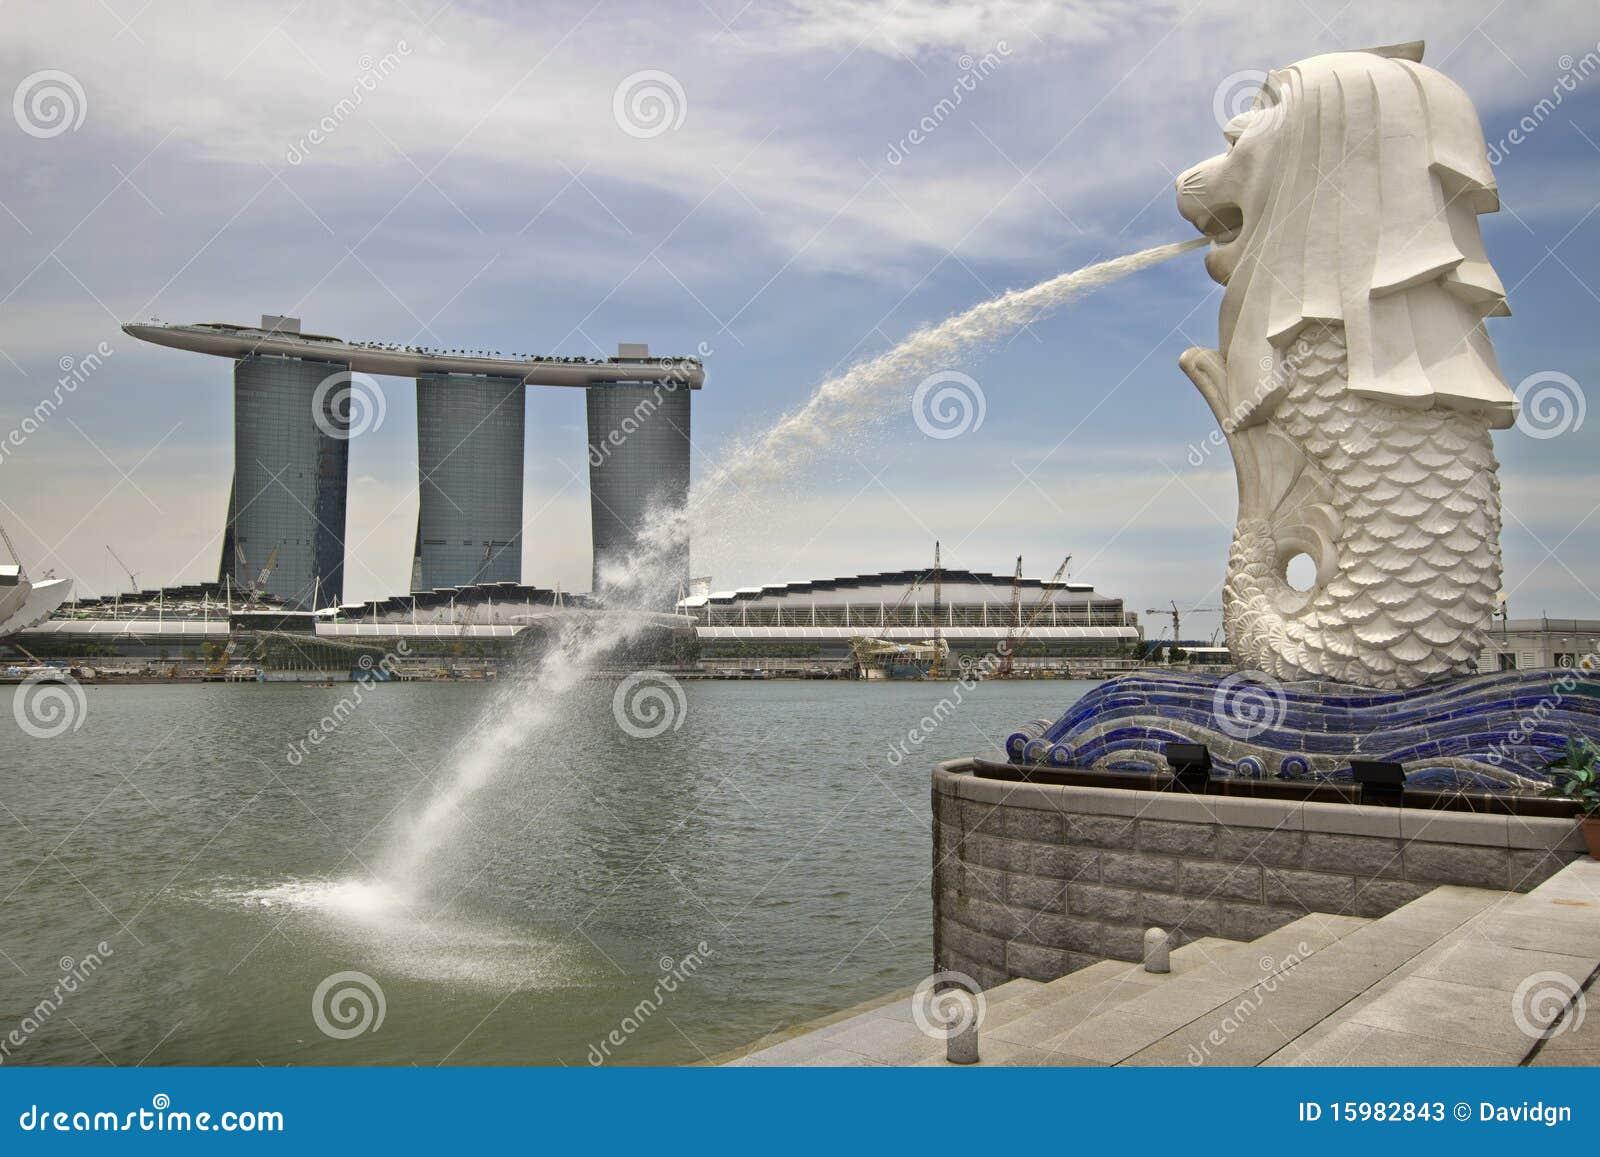 Merlion Statue - Landmark of Singapore | Photo